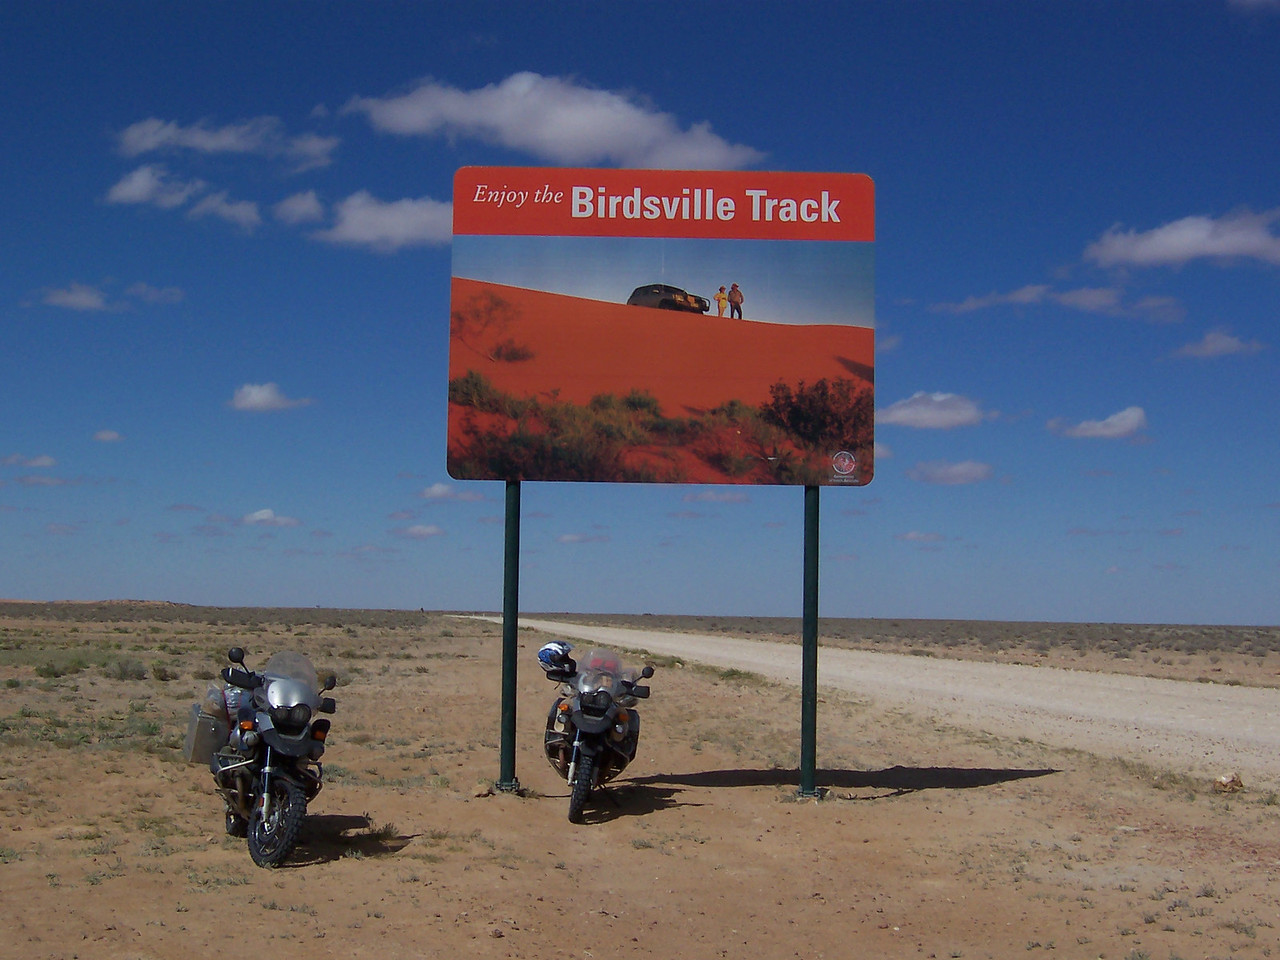 The Birdsville Track